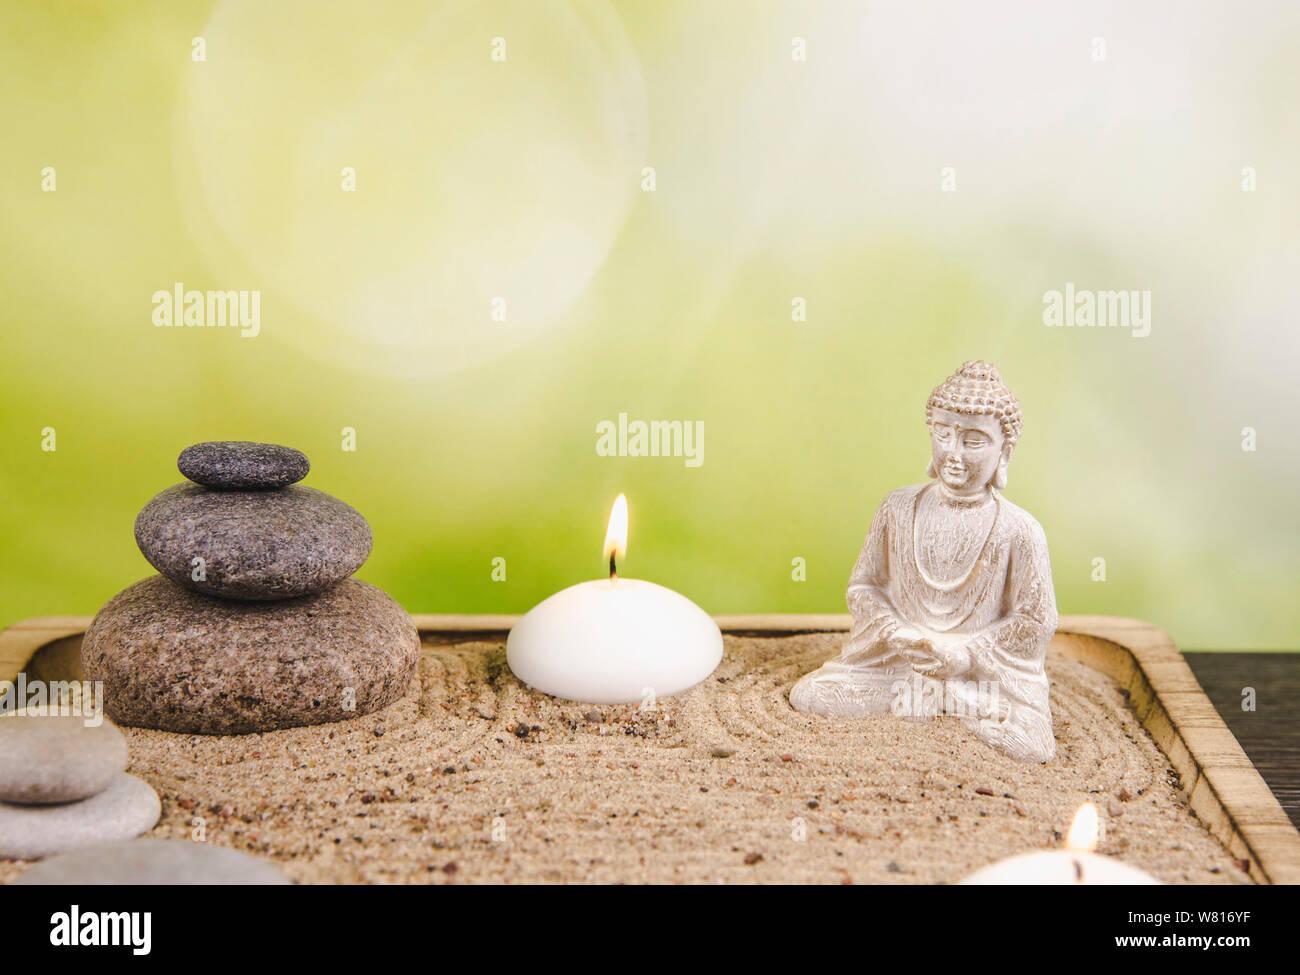 Miniature desk zen sandbox with Buddha figure sit in Lotus position, stacked zen sea stones, spa candles burning against green bokeh studio background Stock Photo